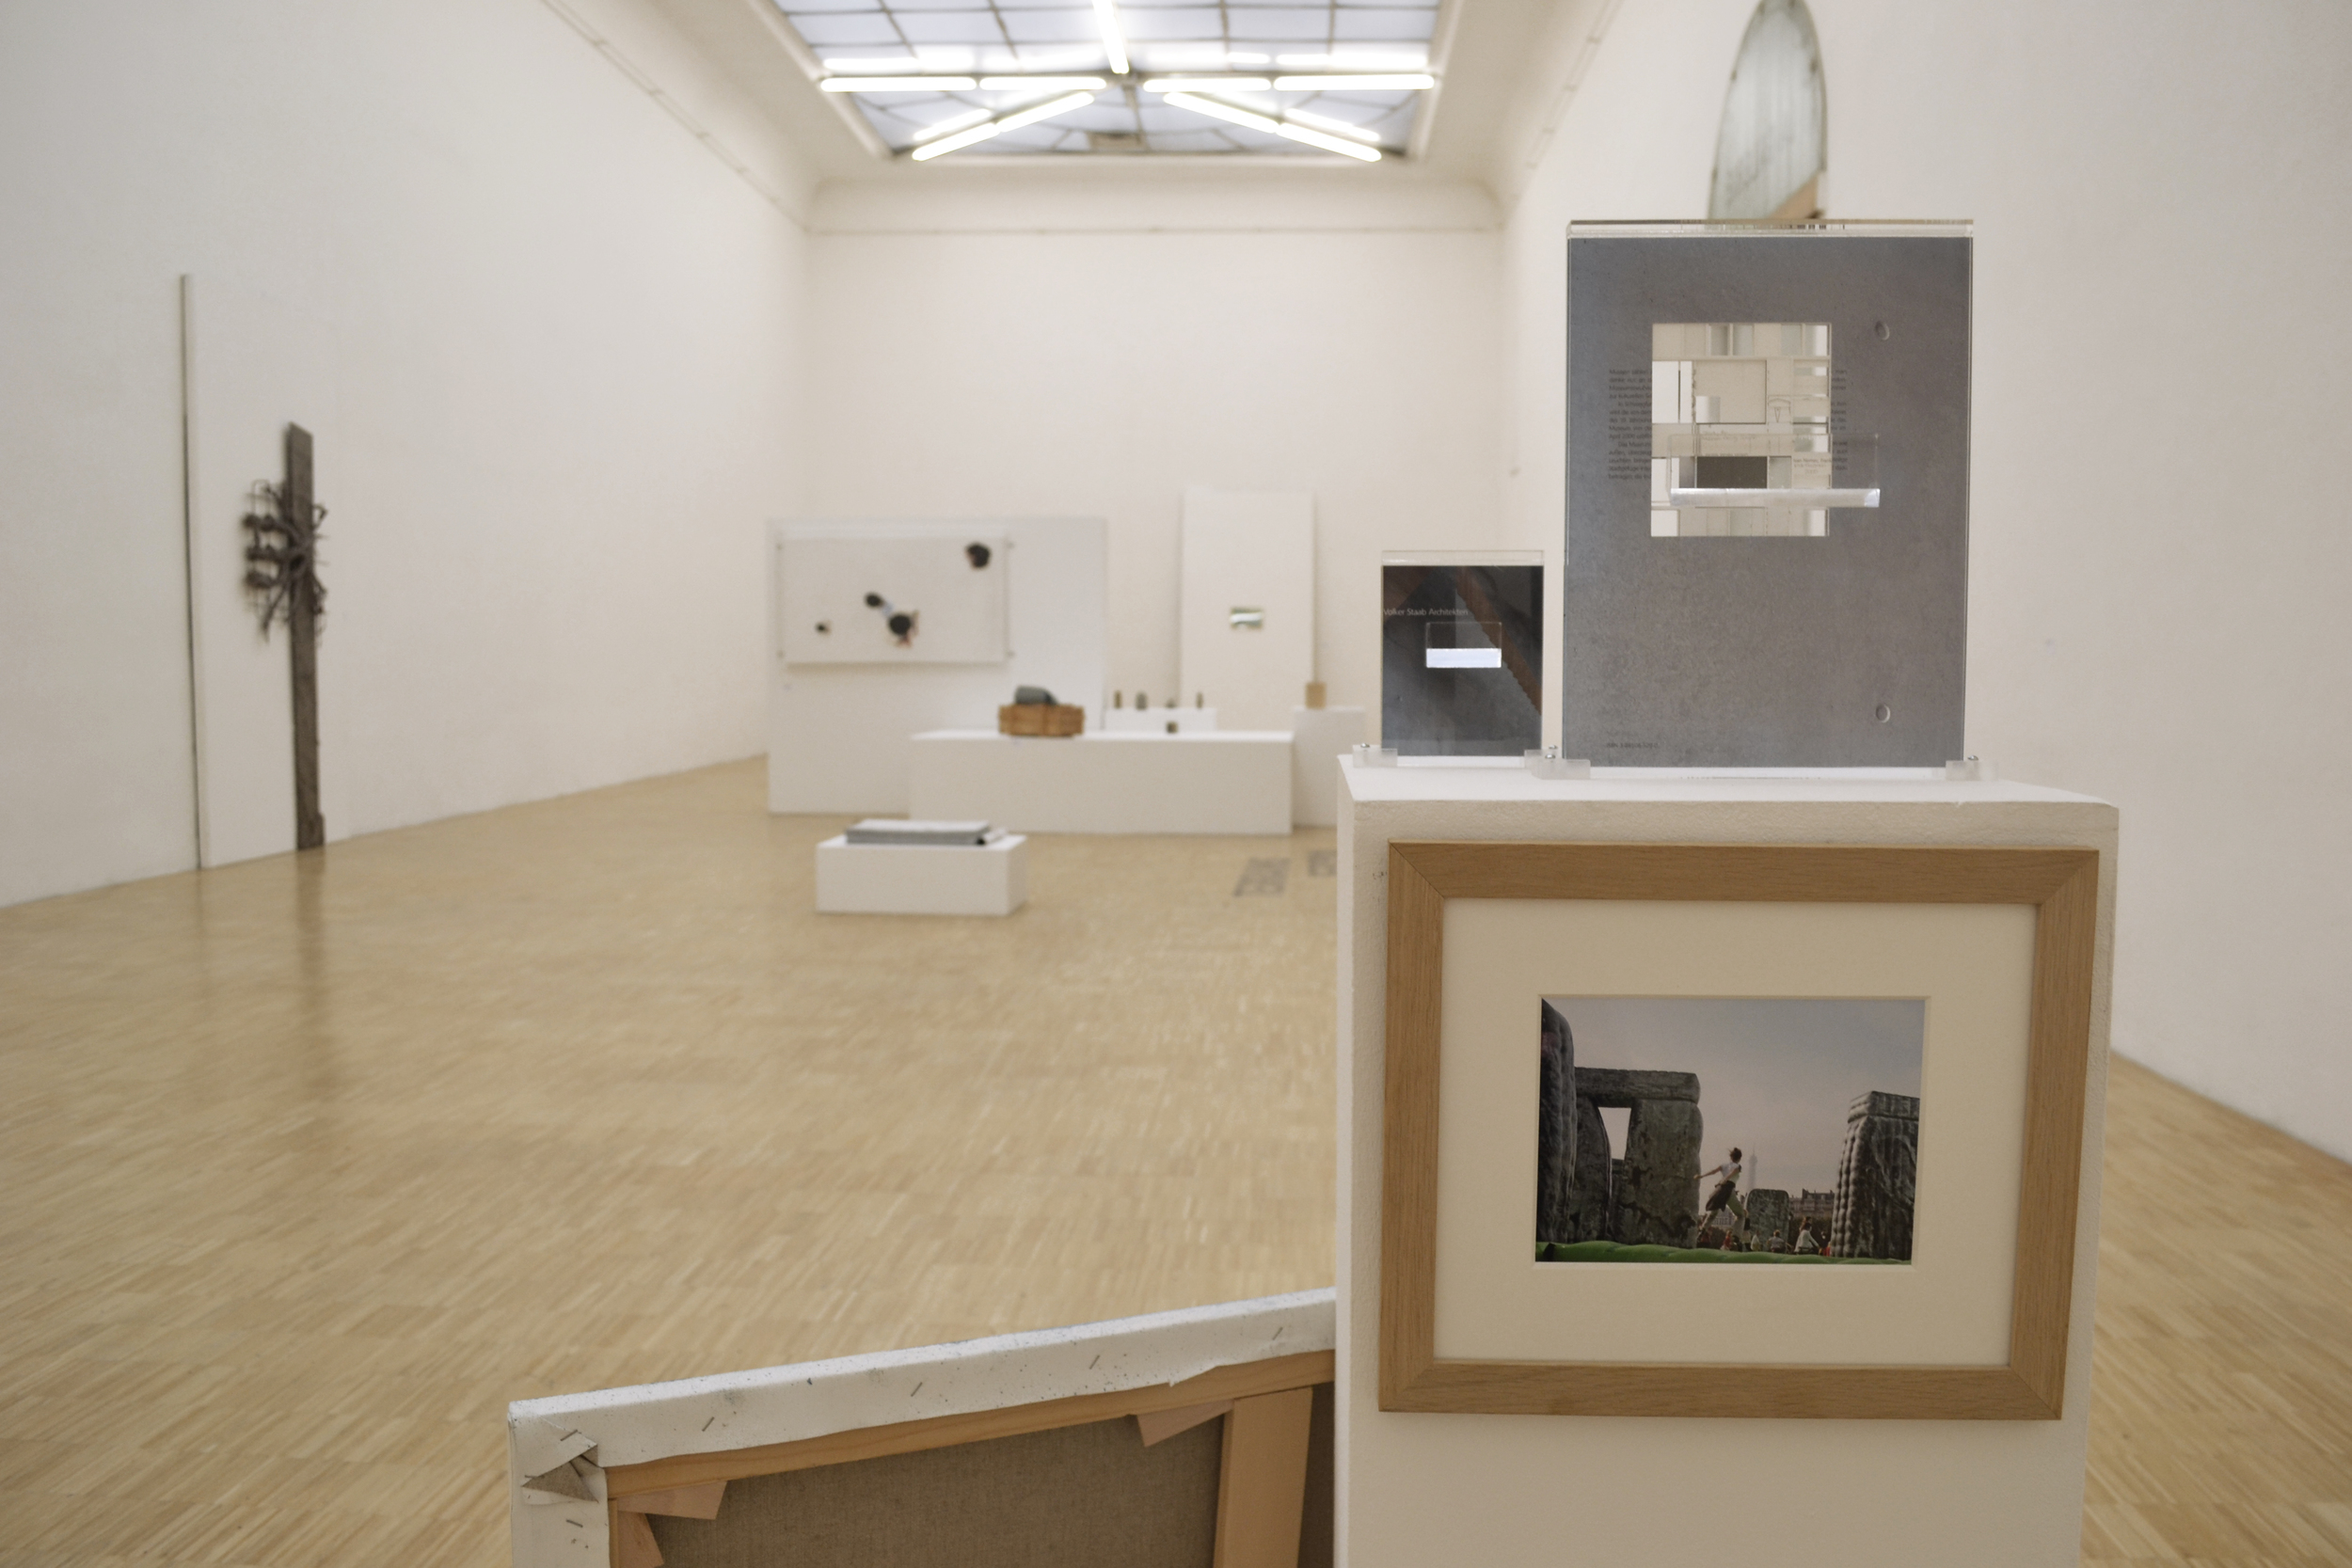 Terrain Vagues , ESAD School of Art and Design, Grenoble (FR) 2014